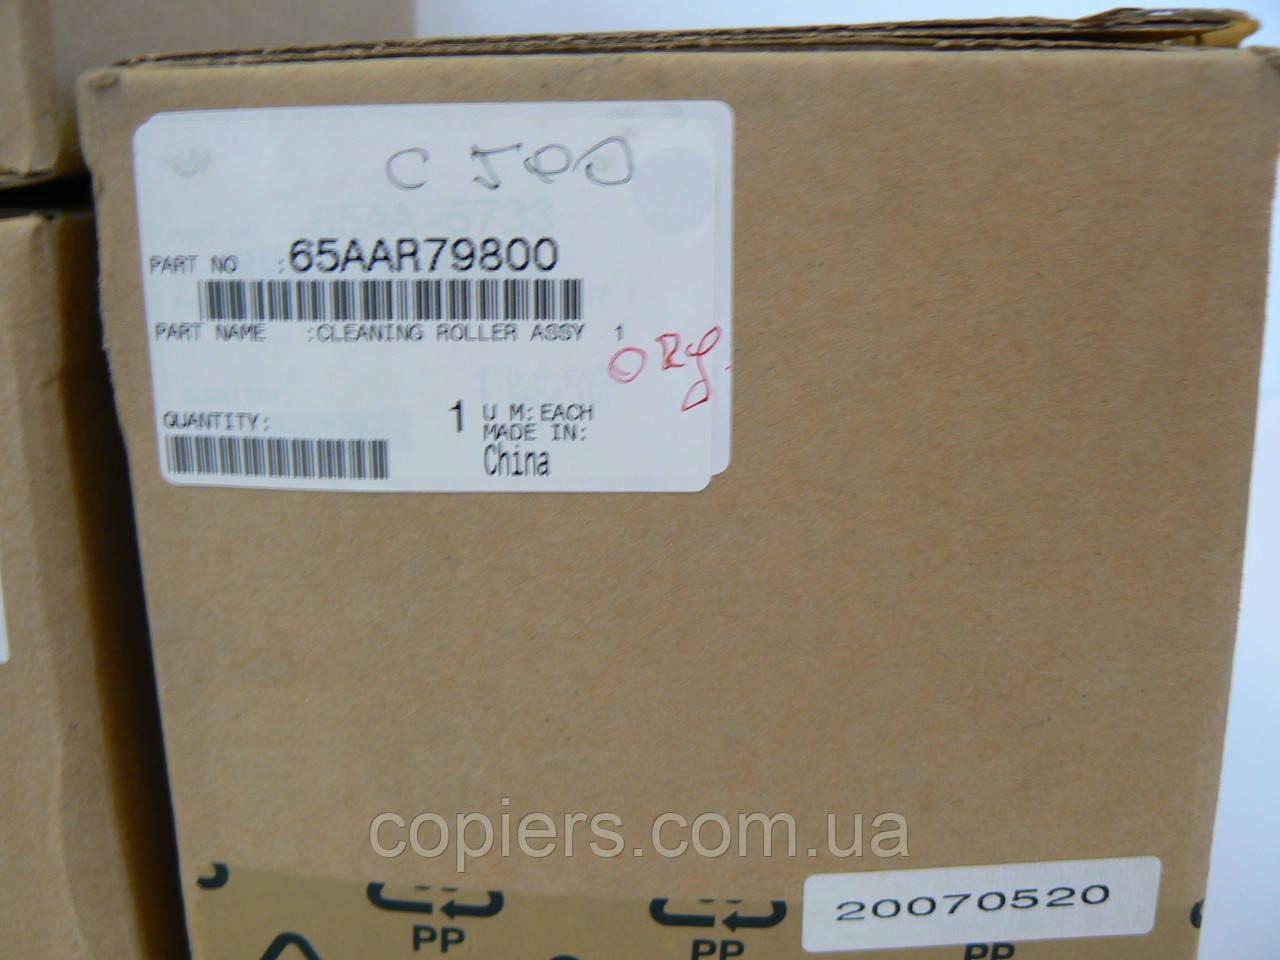 Протирочное полотенце BIZHUB c500 PRO, 8050, cf5001, оригинал, 65AAR79800, 4969-1025-01